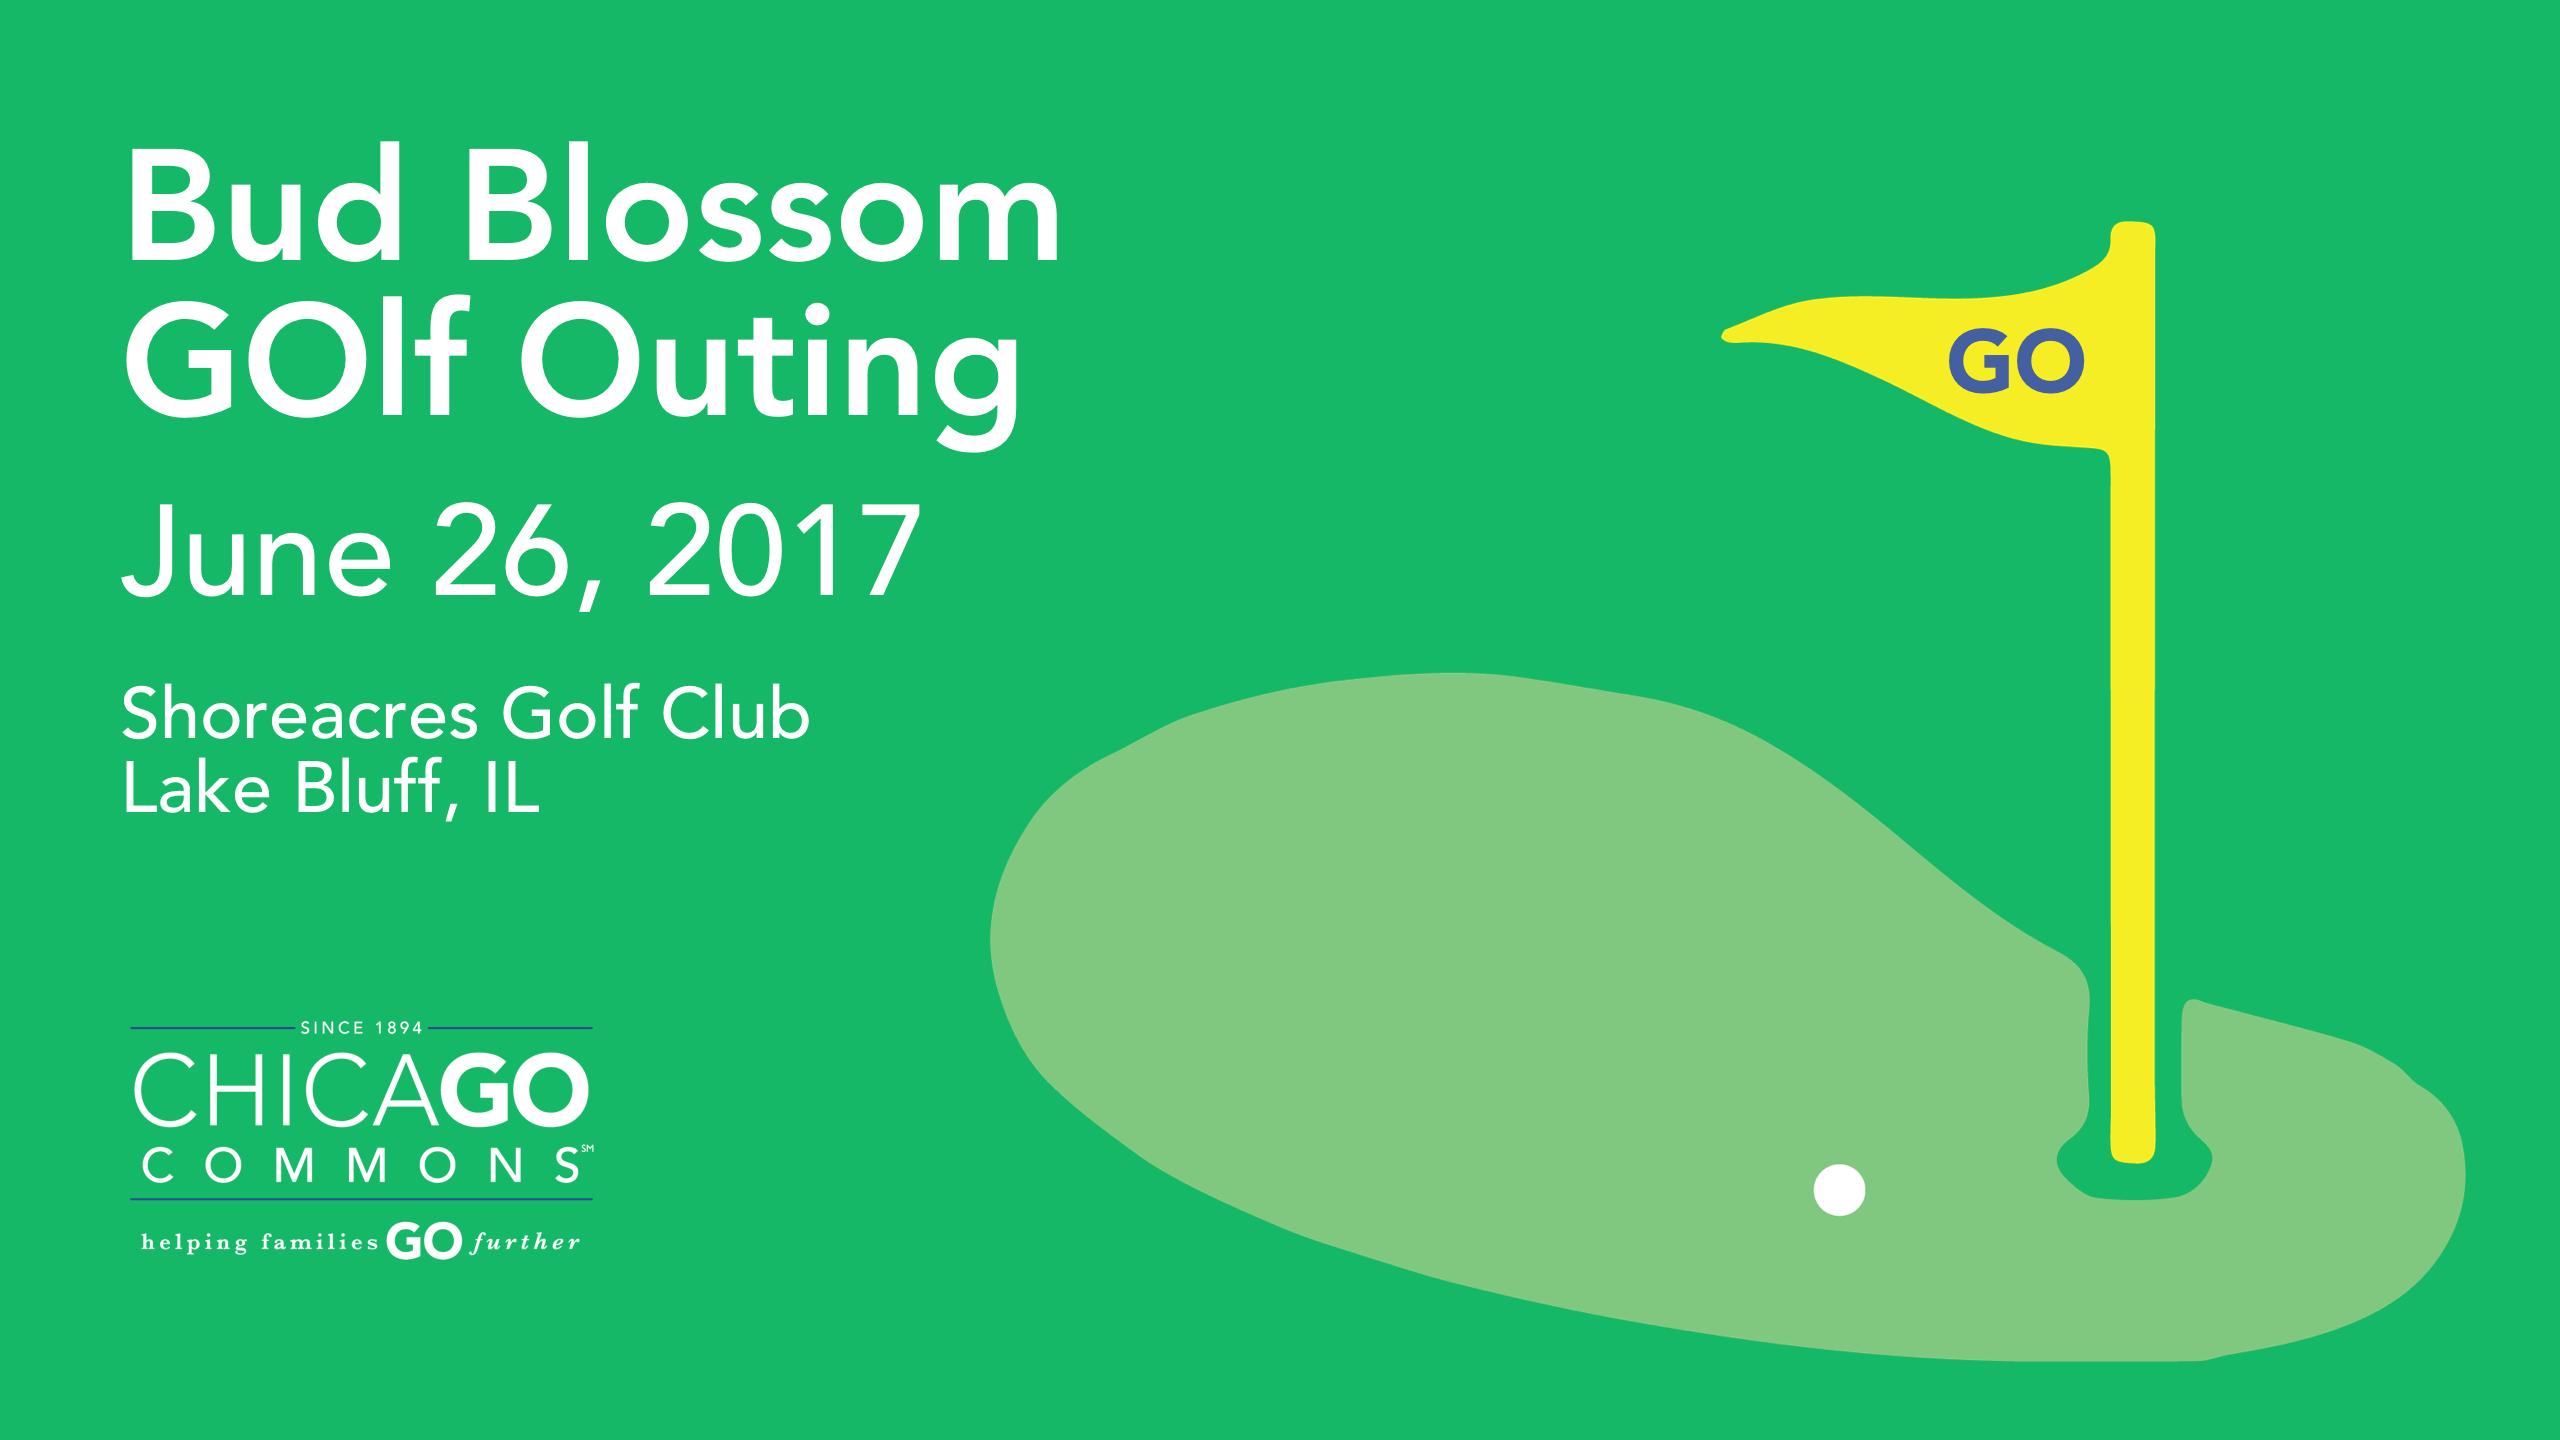 Bud Blossom Golf Outing